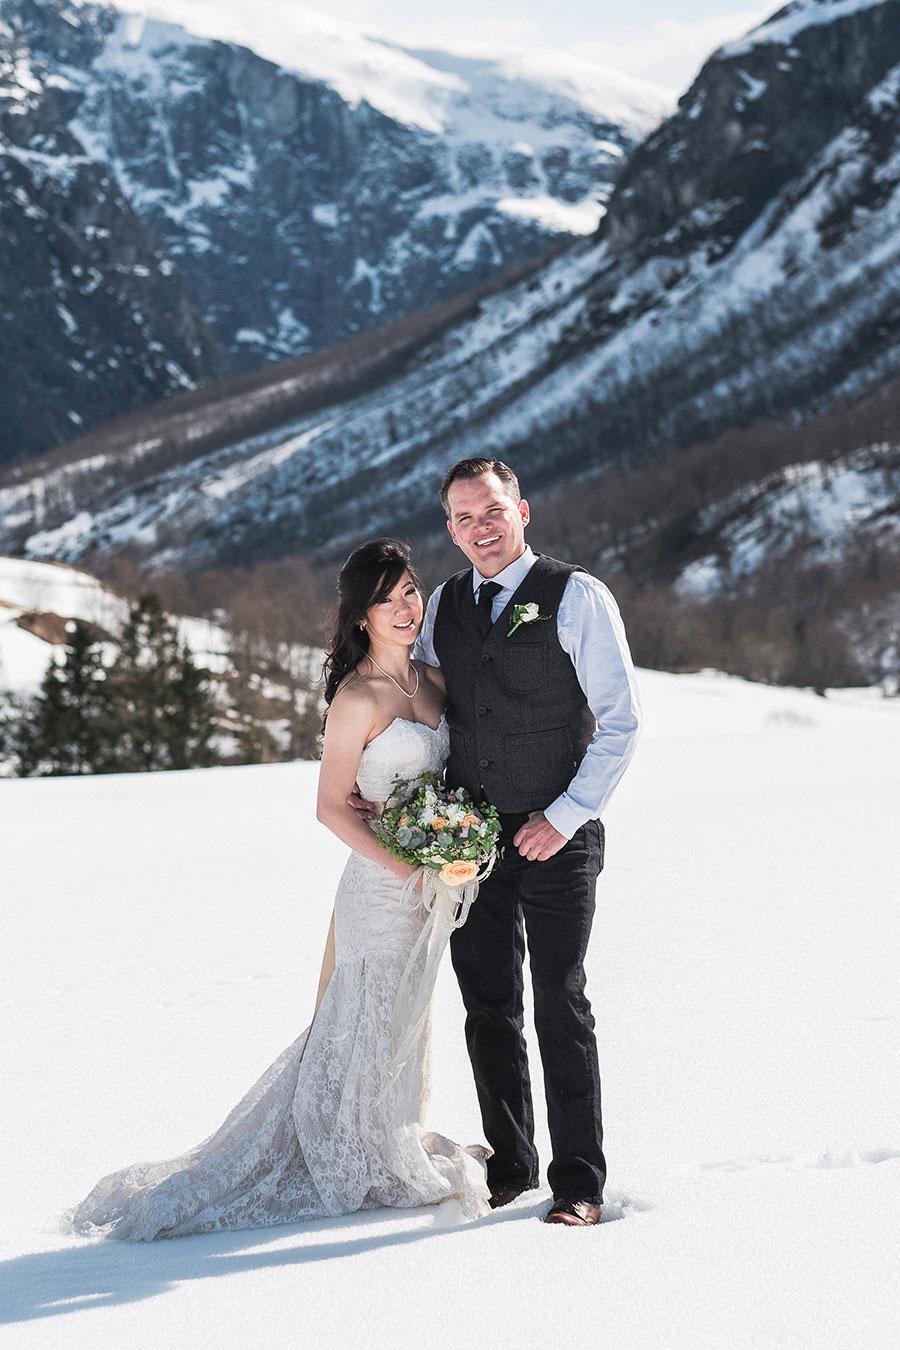 breathtaking-scenic-wedding-in-norway20160914_0147